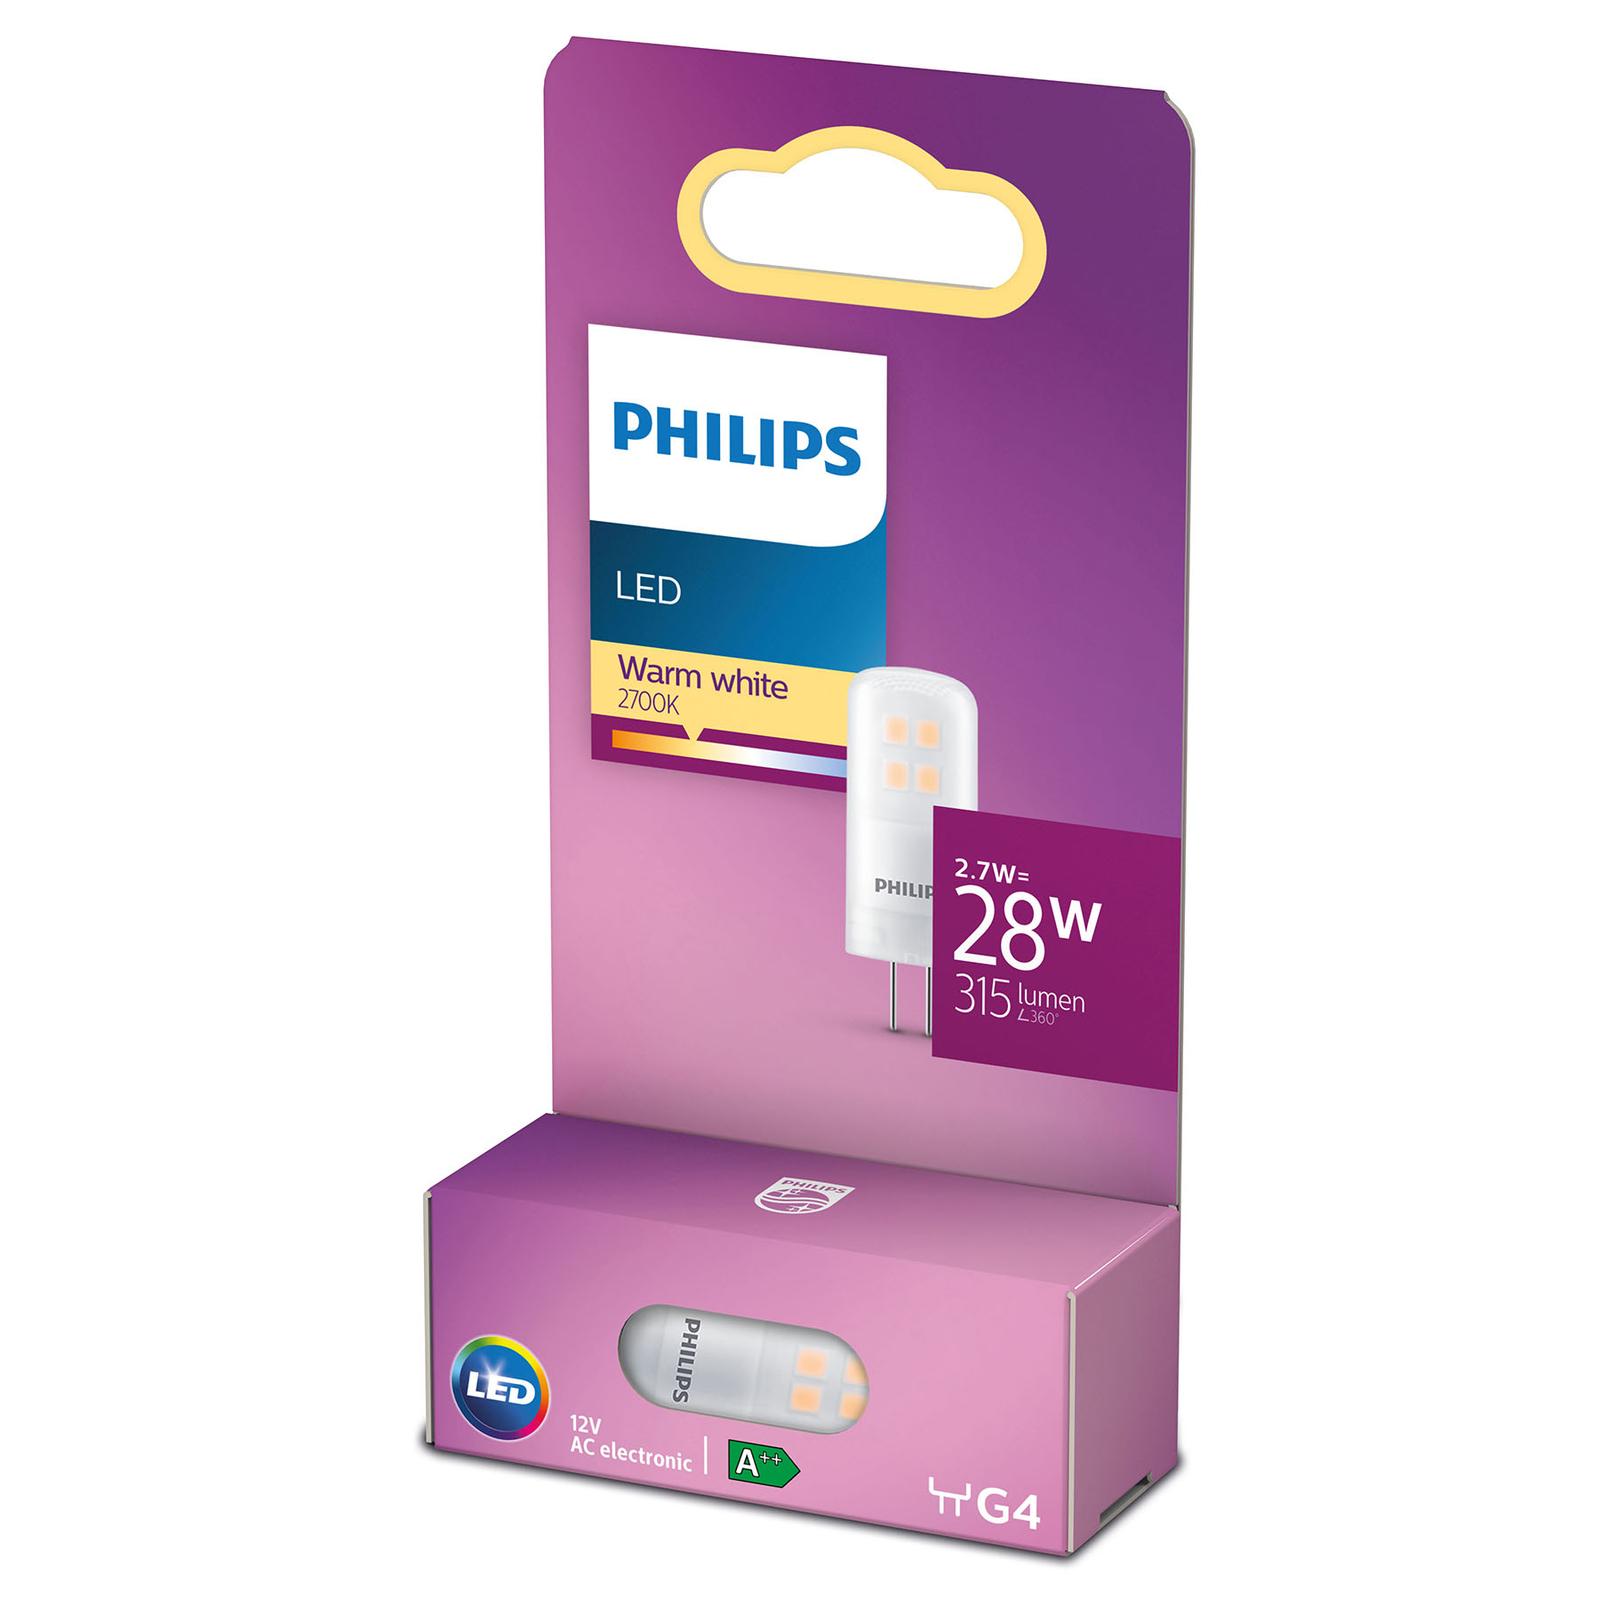 Philips LED bispina G4 2,7W 2.700K satinato